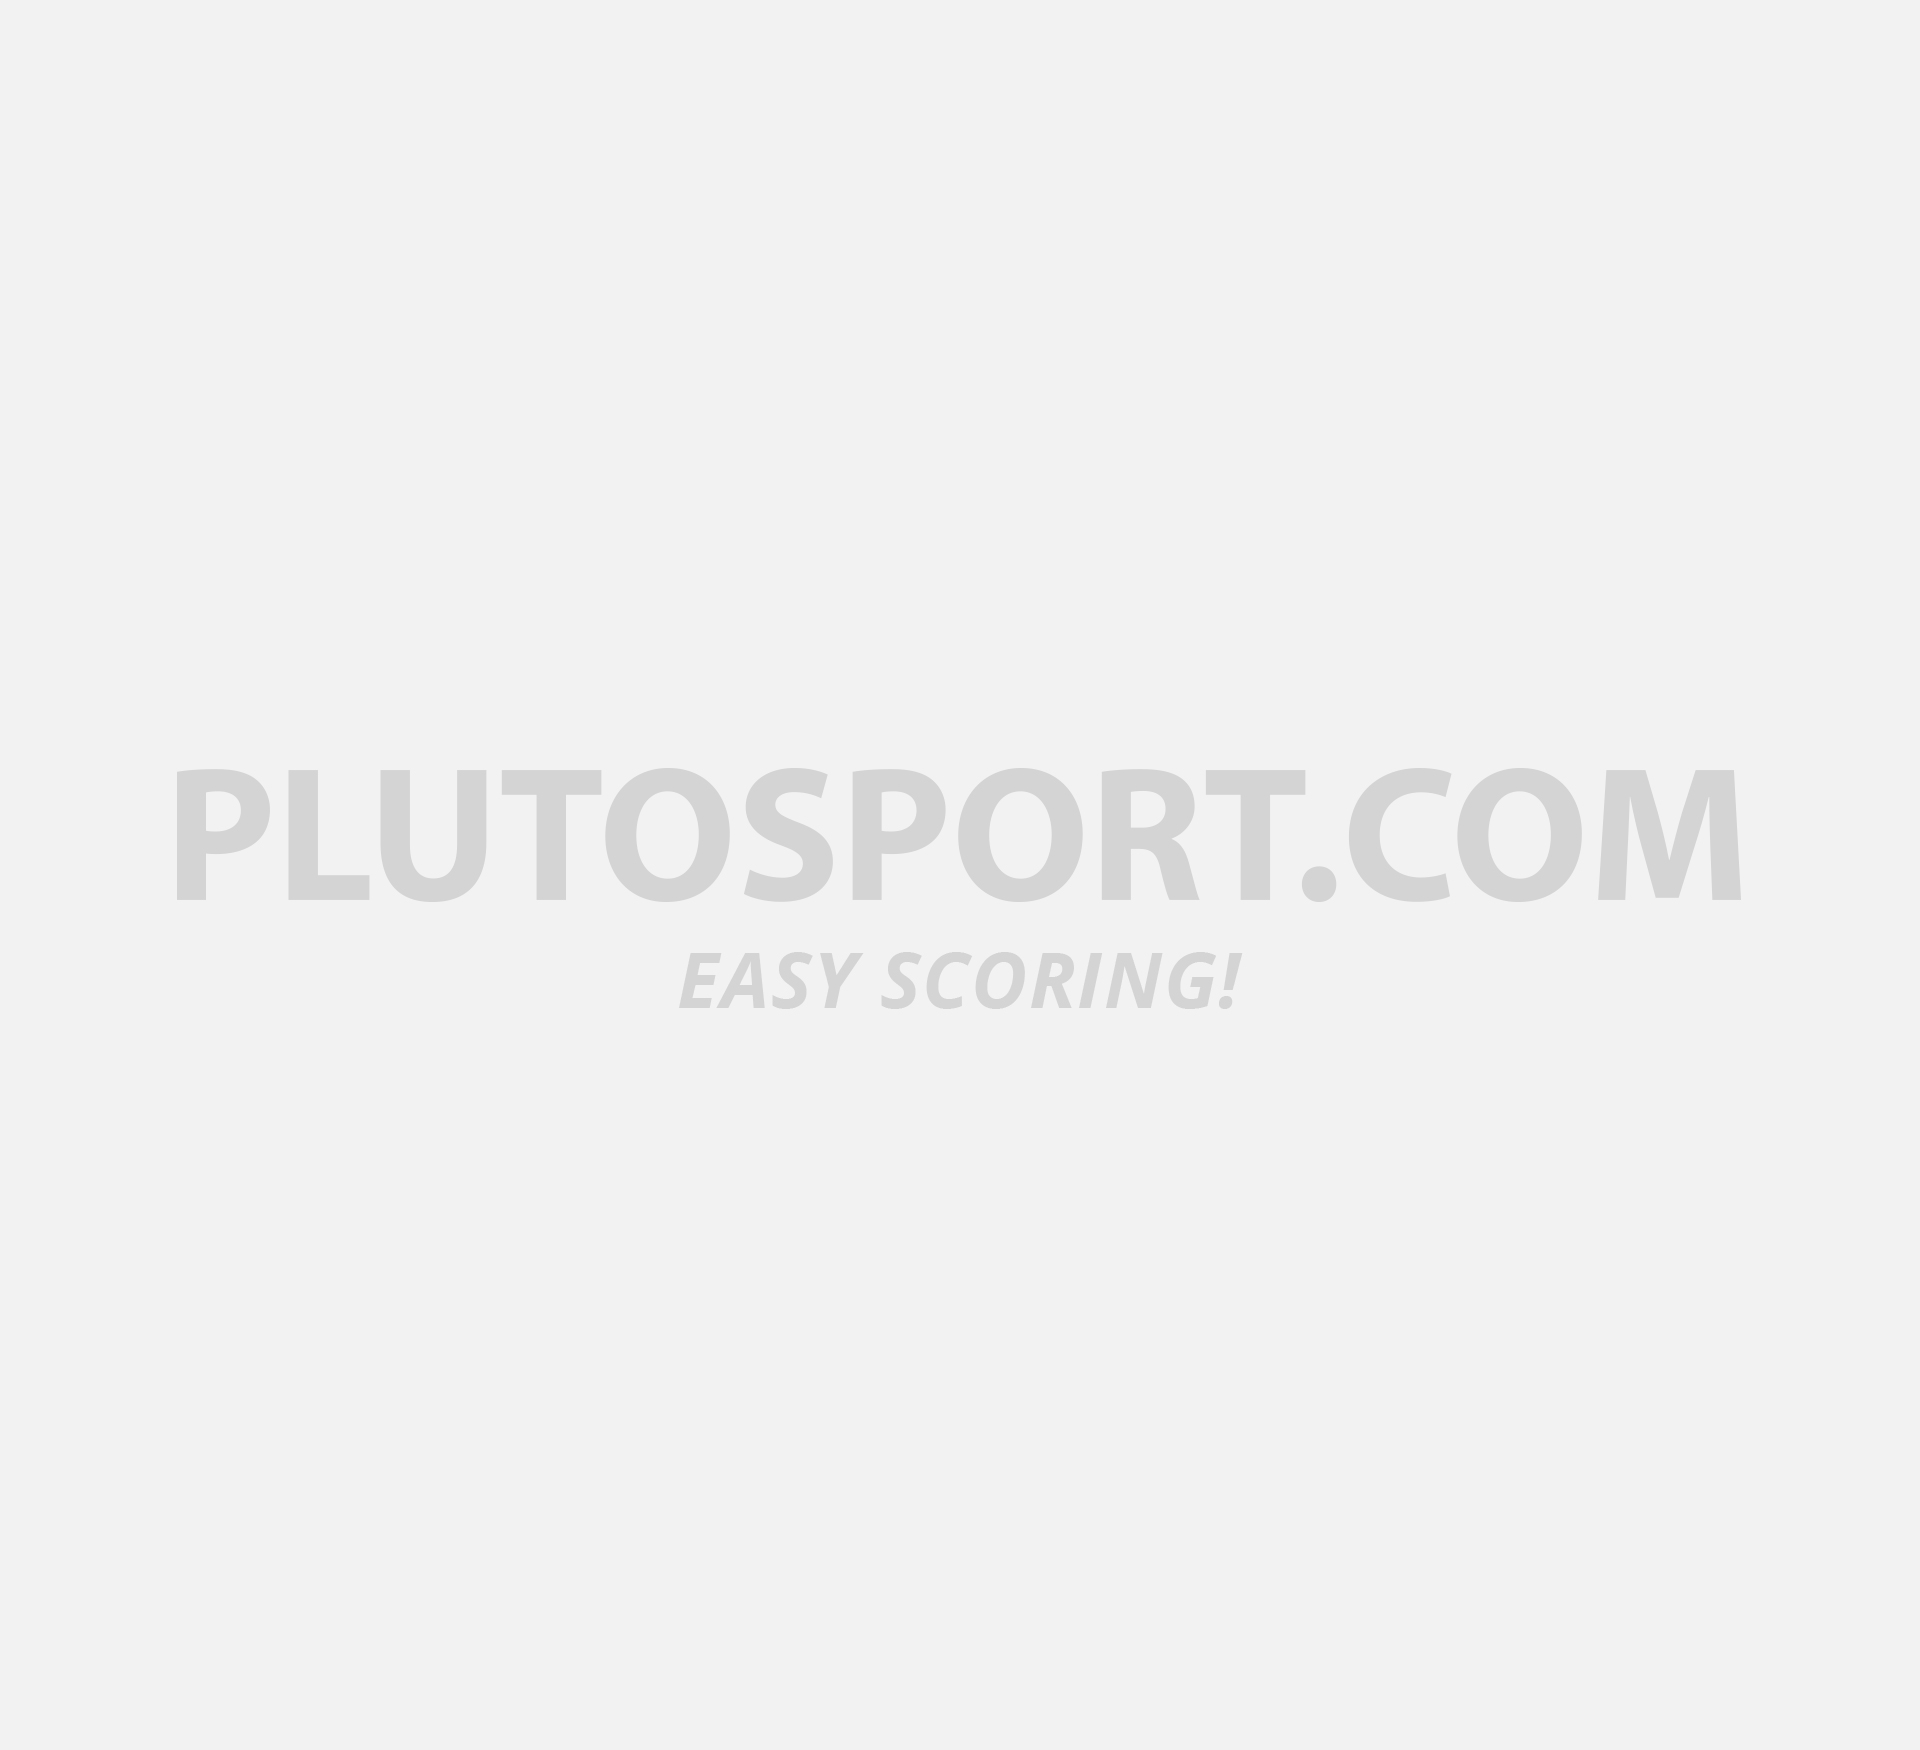 new arrival e4028 c5883 Puma Advanced Short Tight Mens - Shorts - Compression clothing - Clothing -  Football - Sports   Plutosport